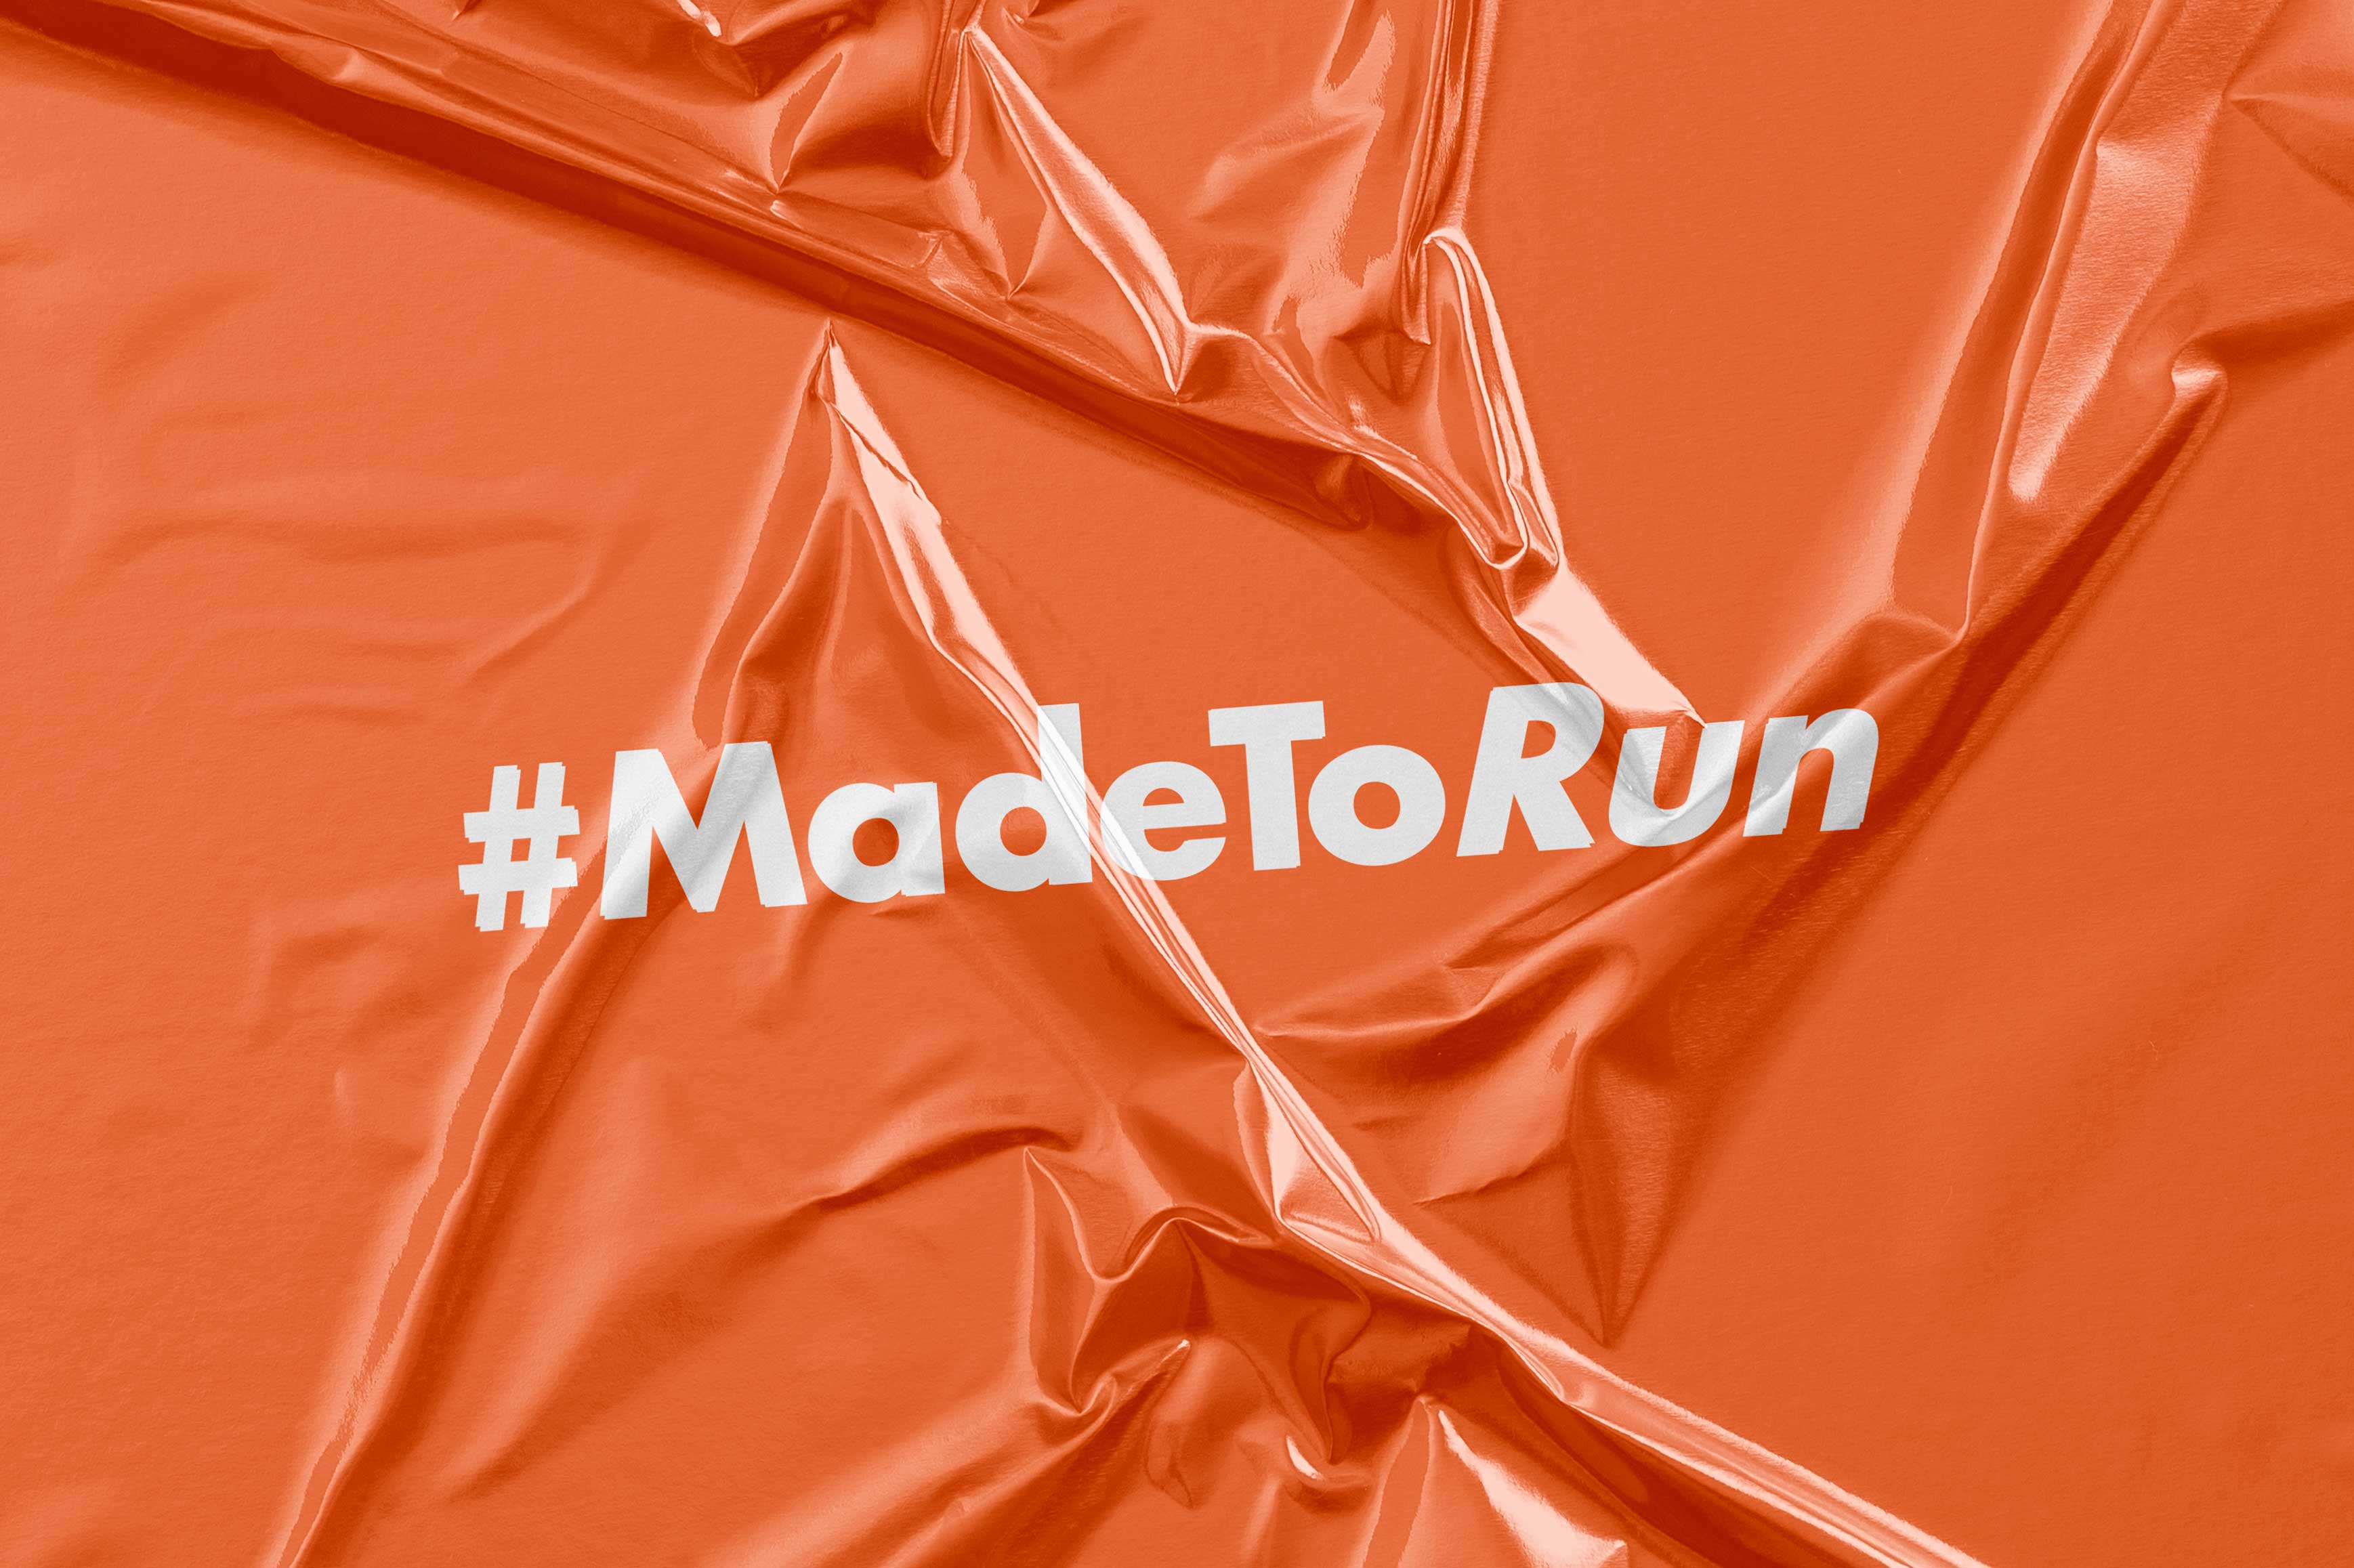 Made-to-run-Plastico